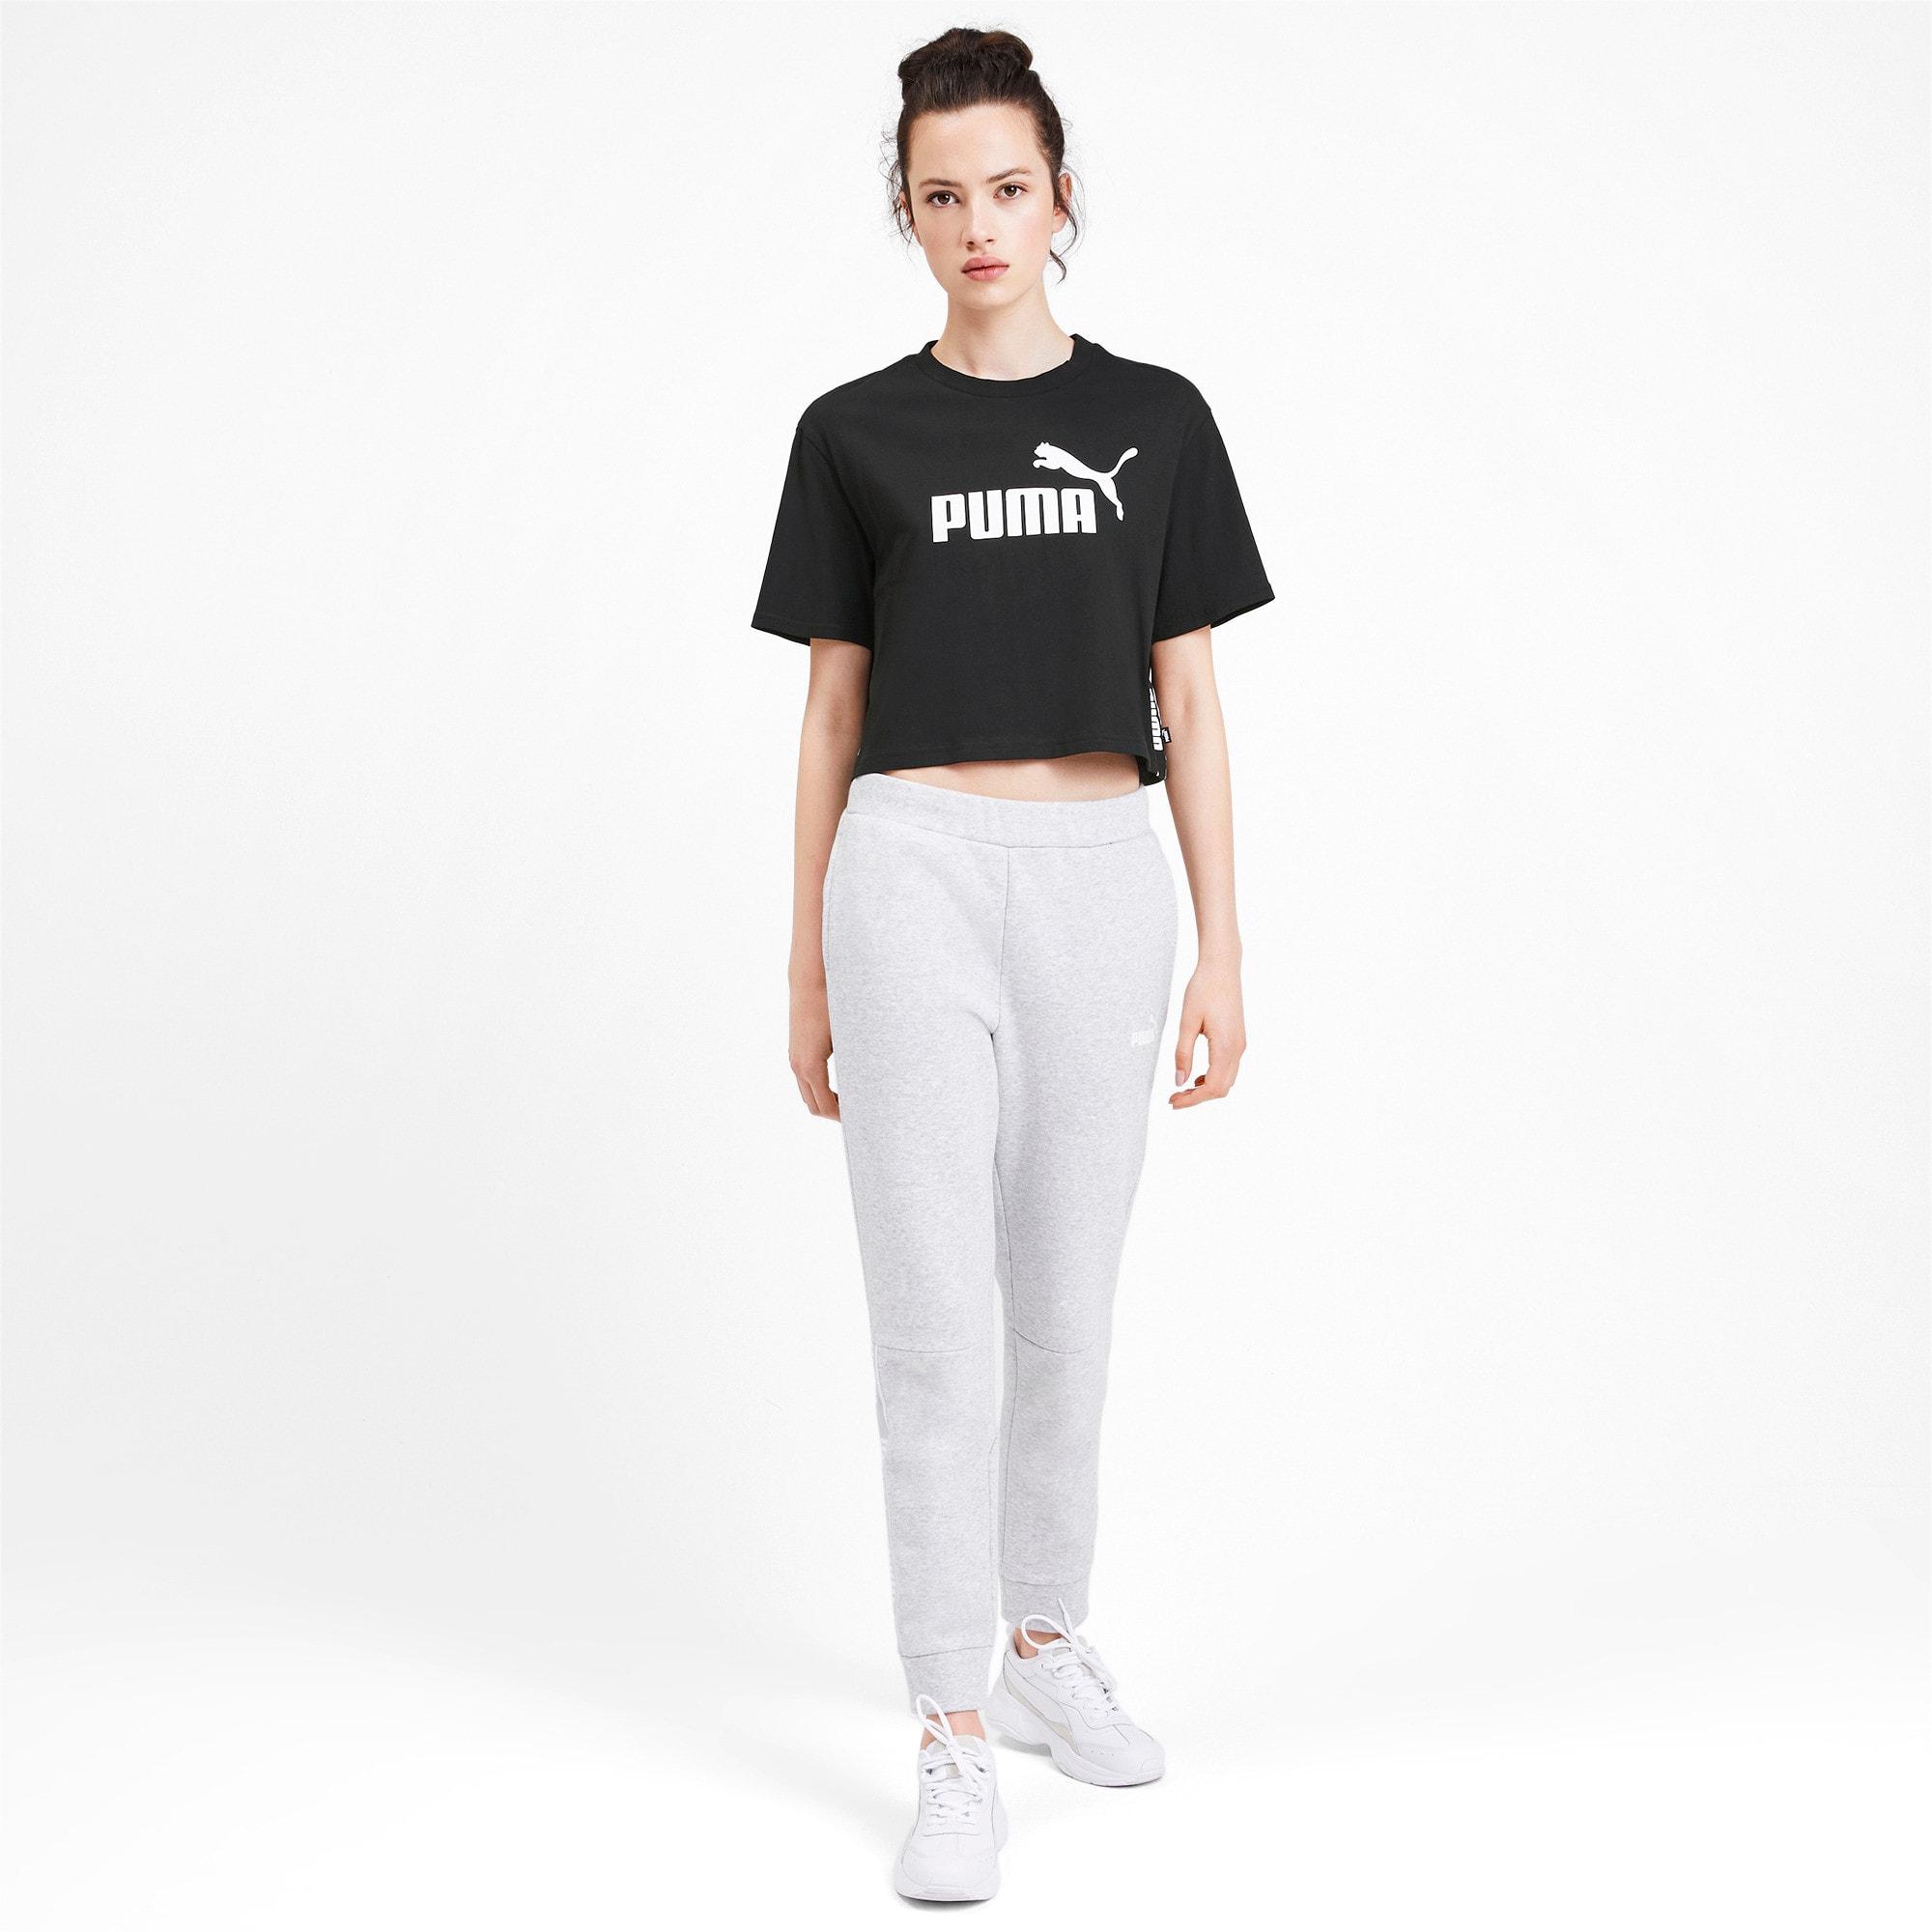 Miniatura 4 de Camiseta corta Amplified para mujer, Puma Black, mediano